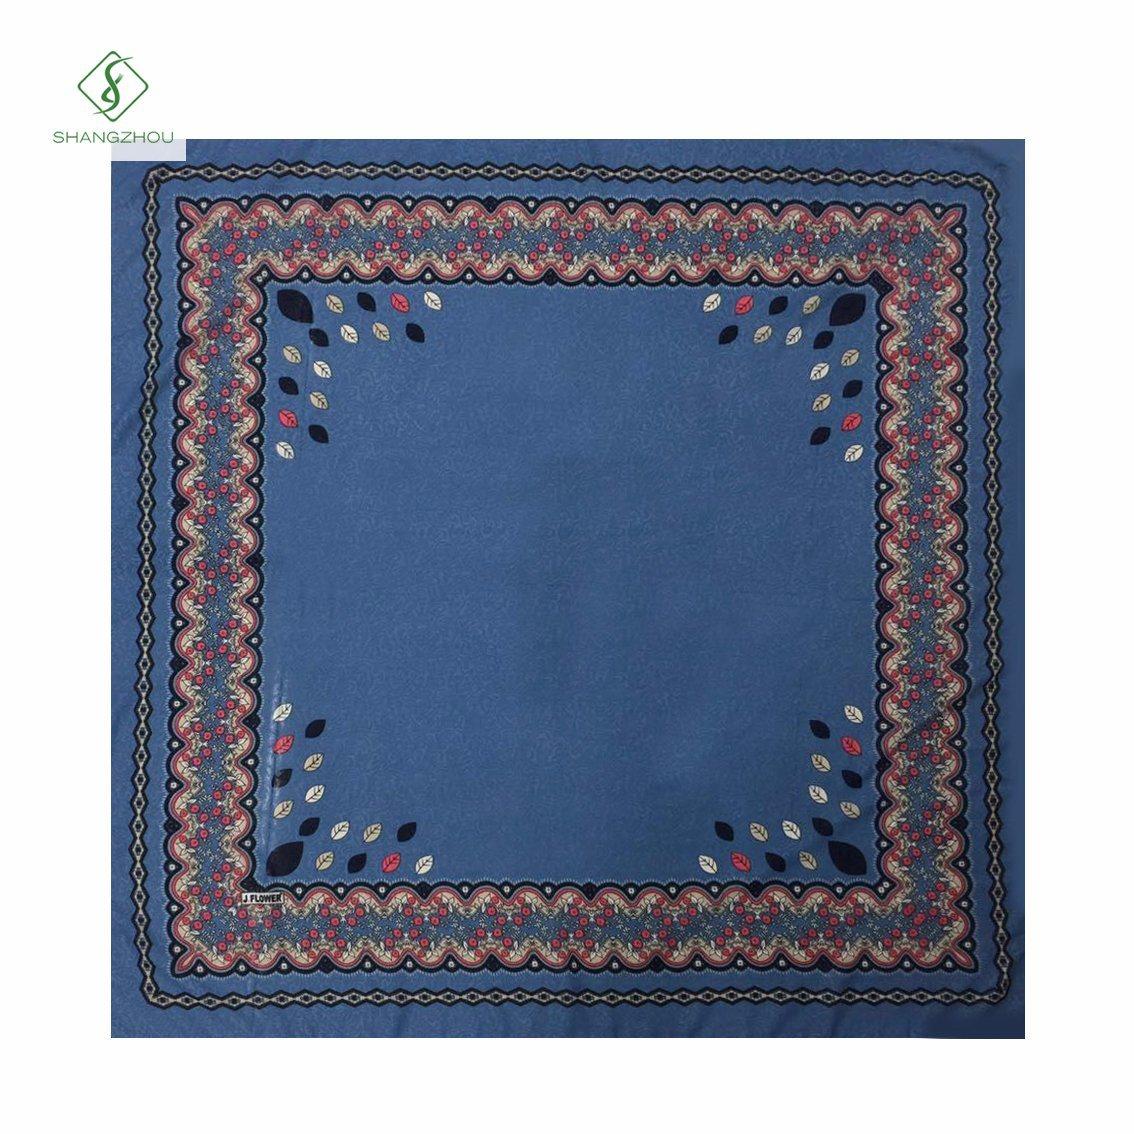 Hot Sale Fashion Square Scarf French Cotton Printed Muslim Hijab